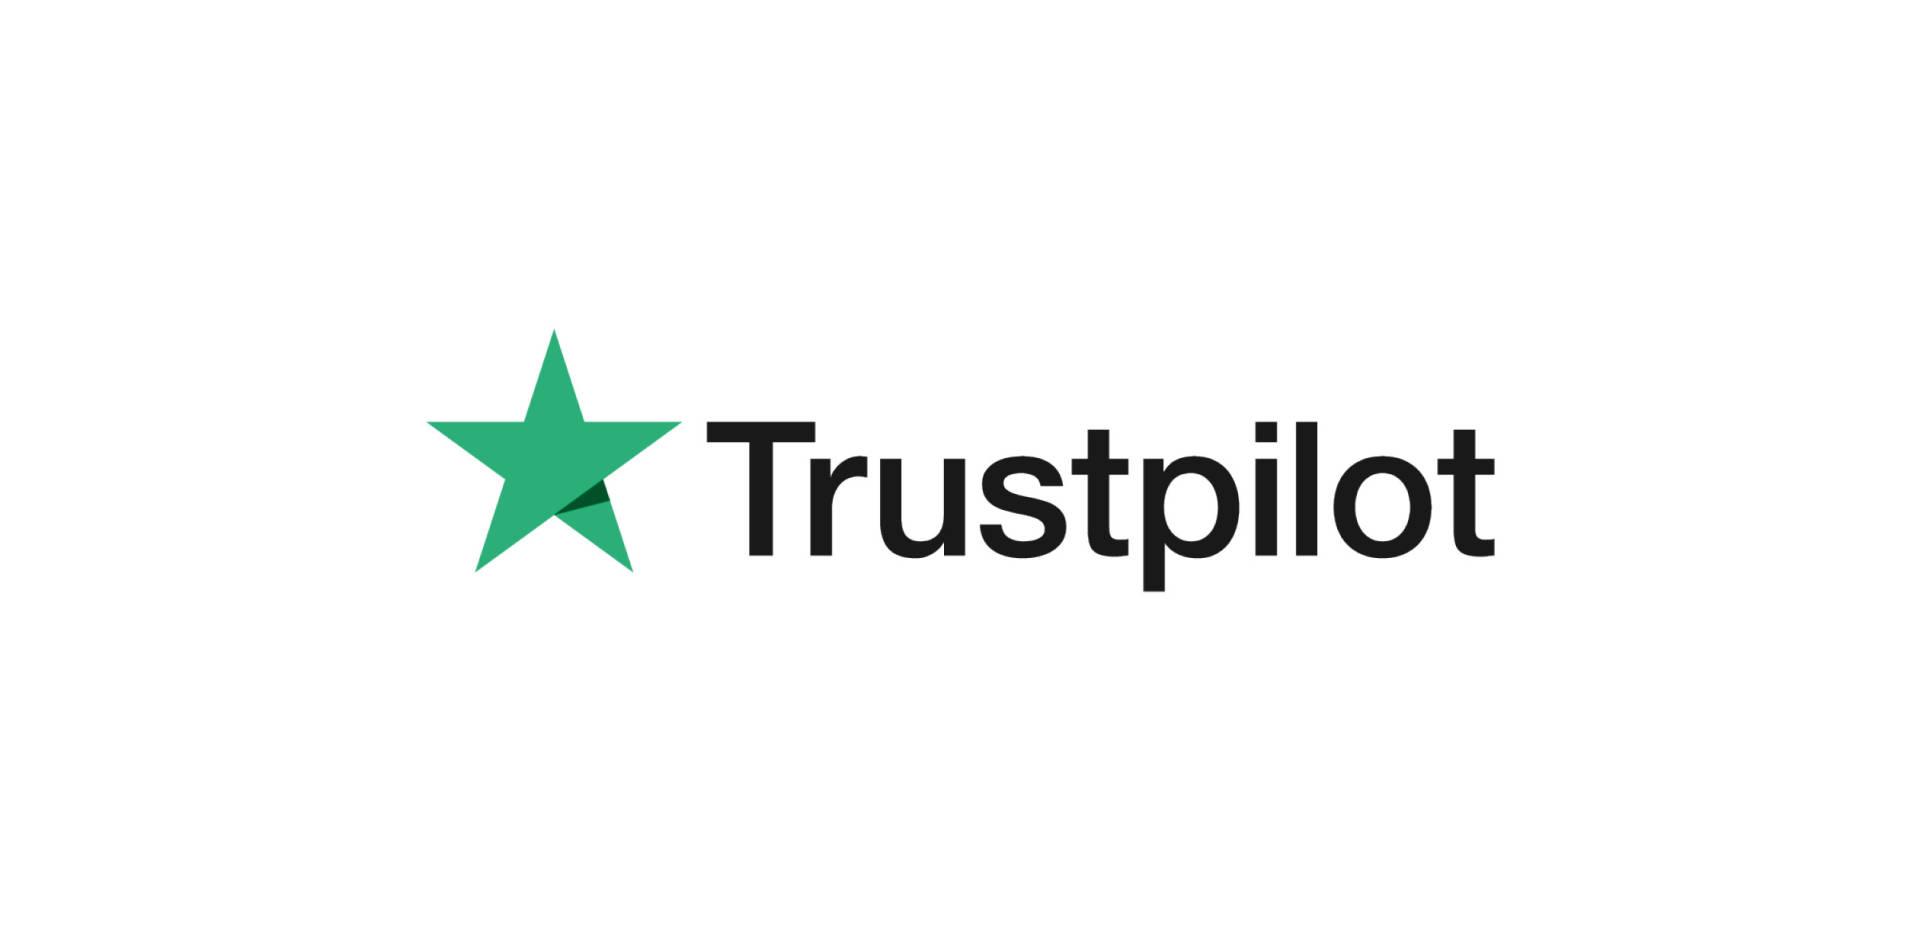 Trustpilot logo 2520 x 1224